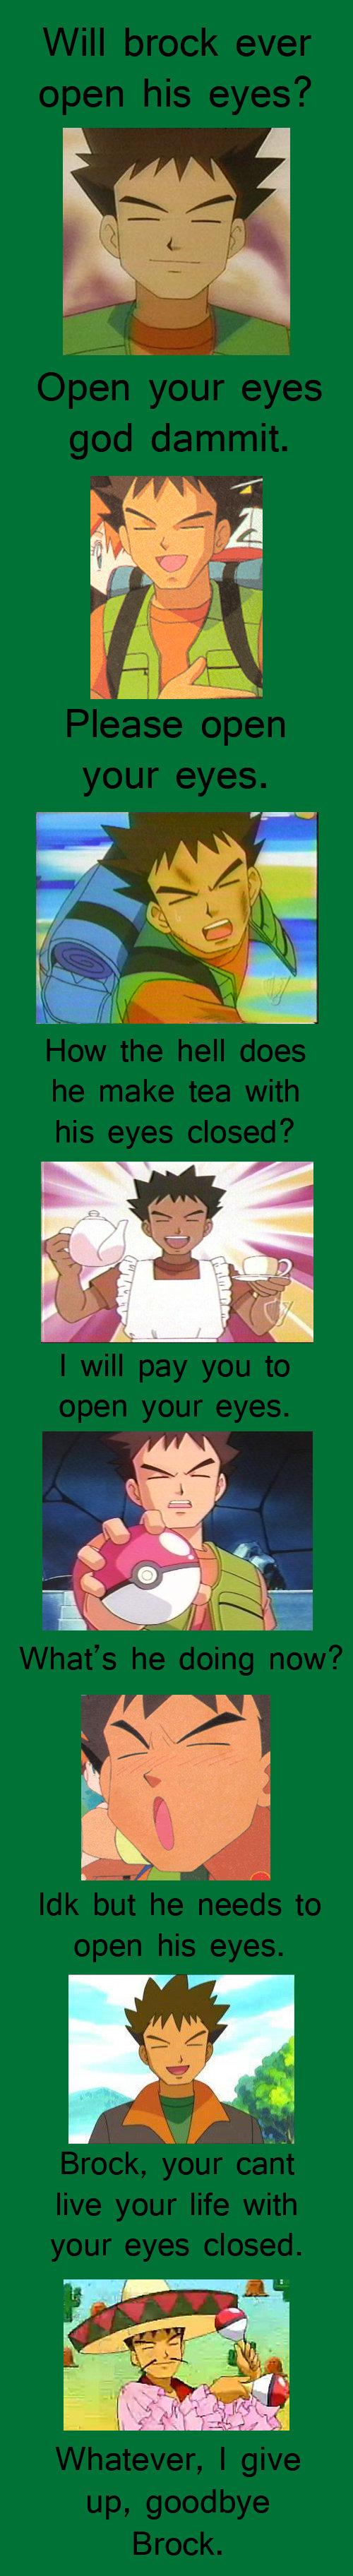 Brock won't open his eyes. he just annoys me.. yo mama so fat Brock went O.o brock Pokemon funny